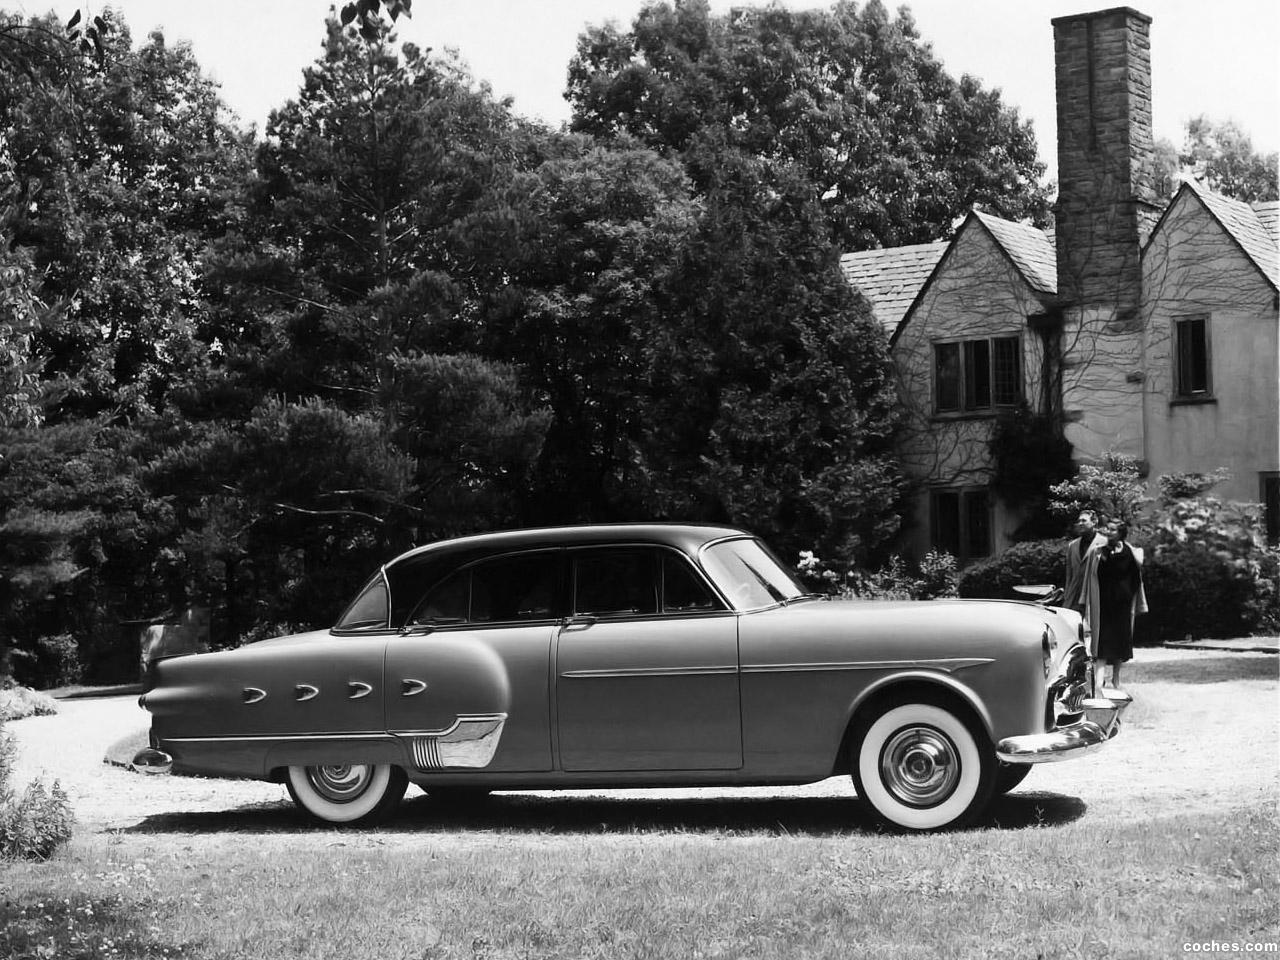 Foto 2 de Packard Patrician 400 Touring Sedan 1952